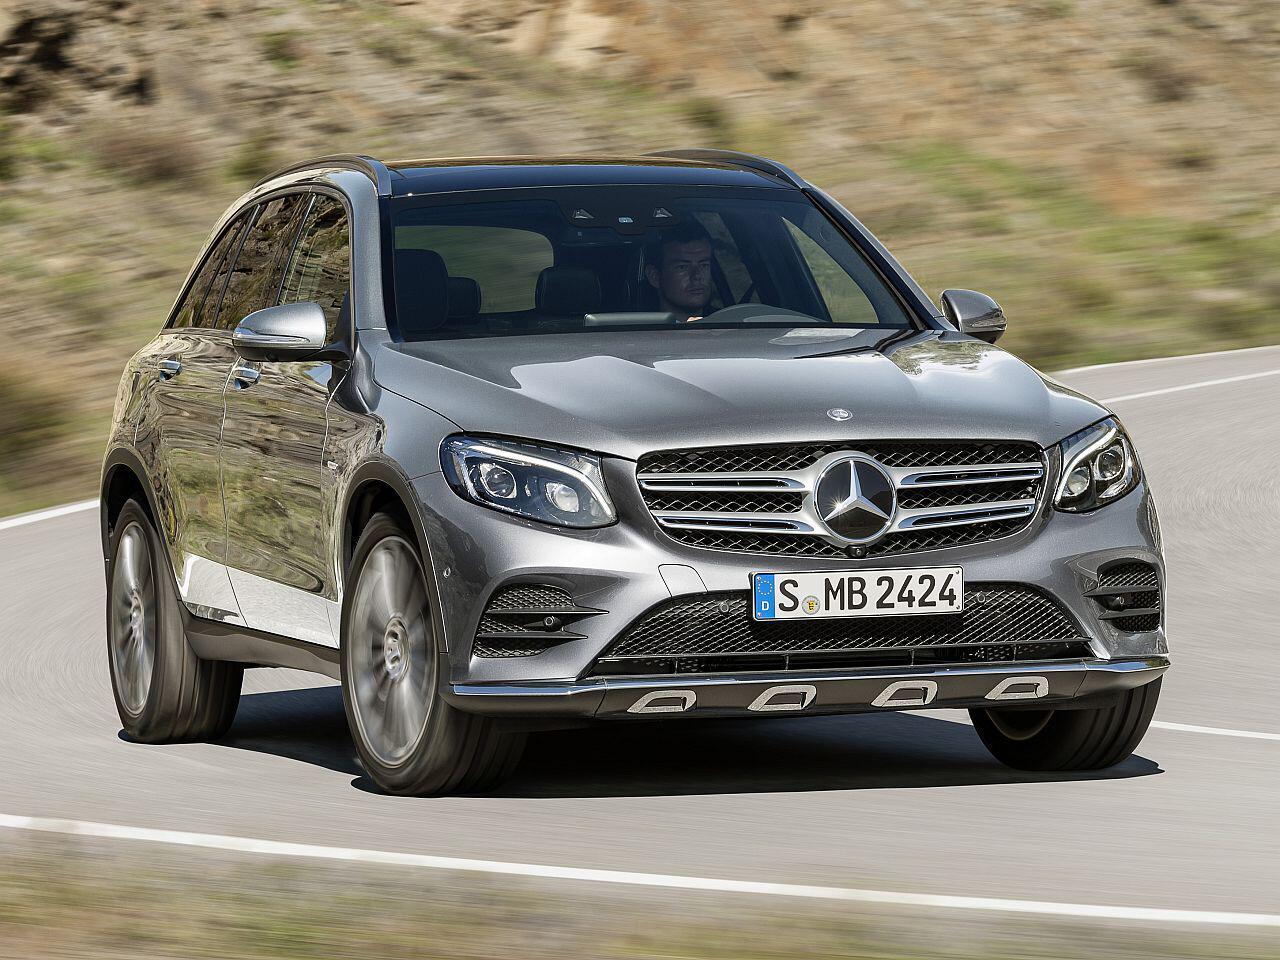 Bild zu Platz 14: Mercedes GLK/GLC